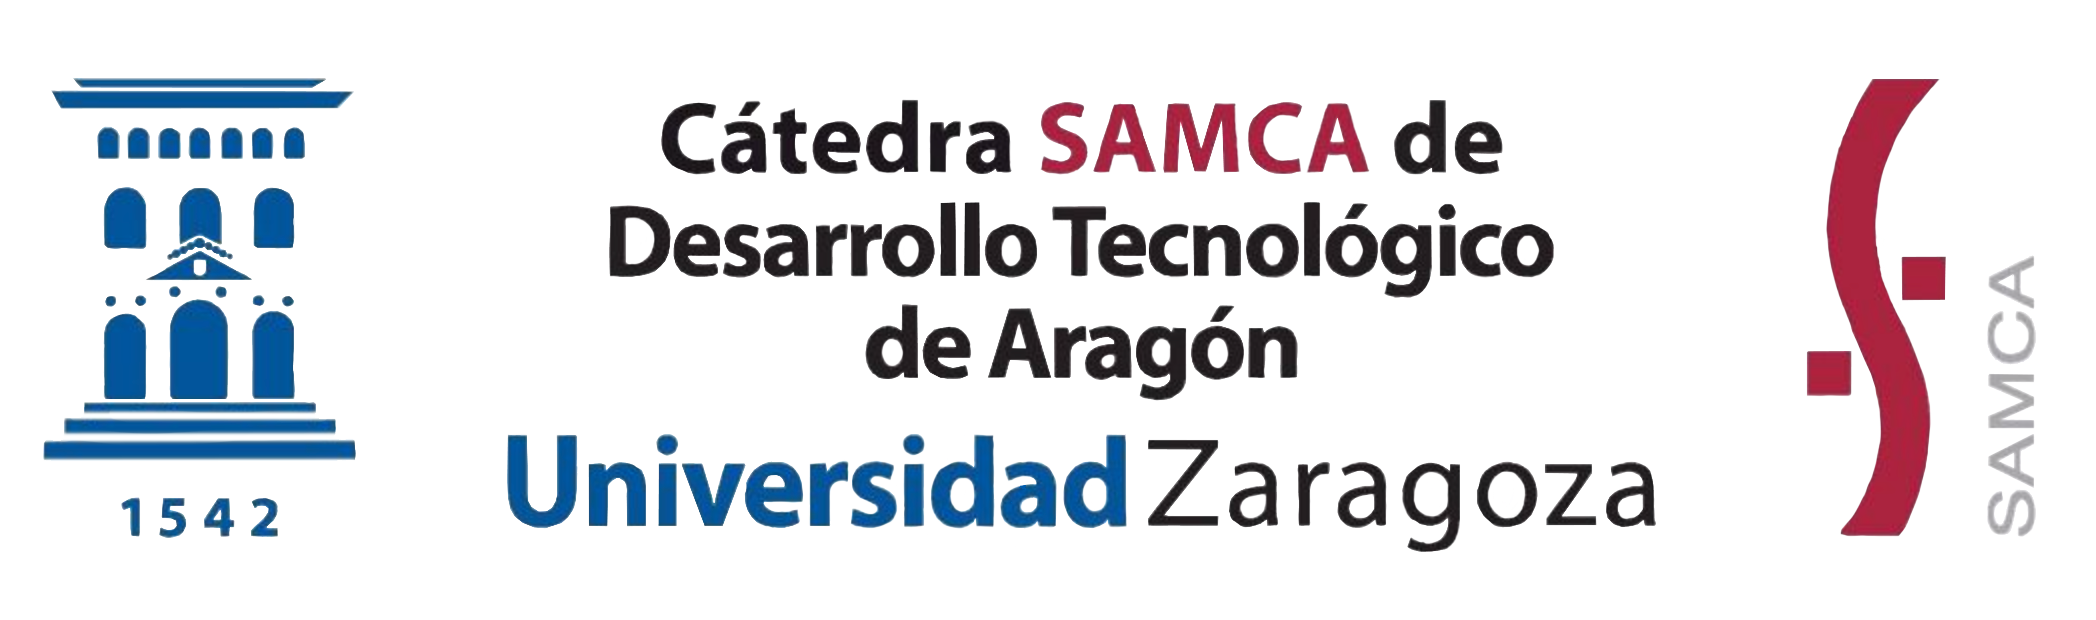 SamcaCatedraDes